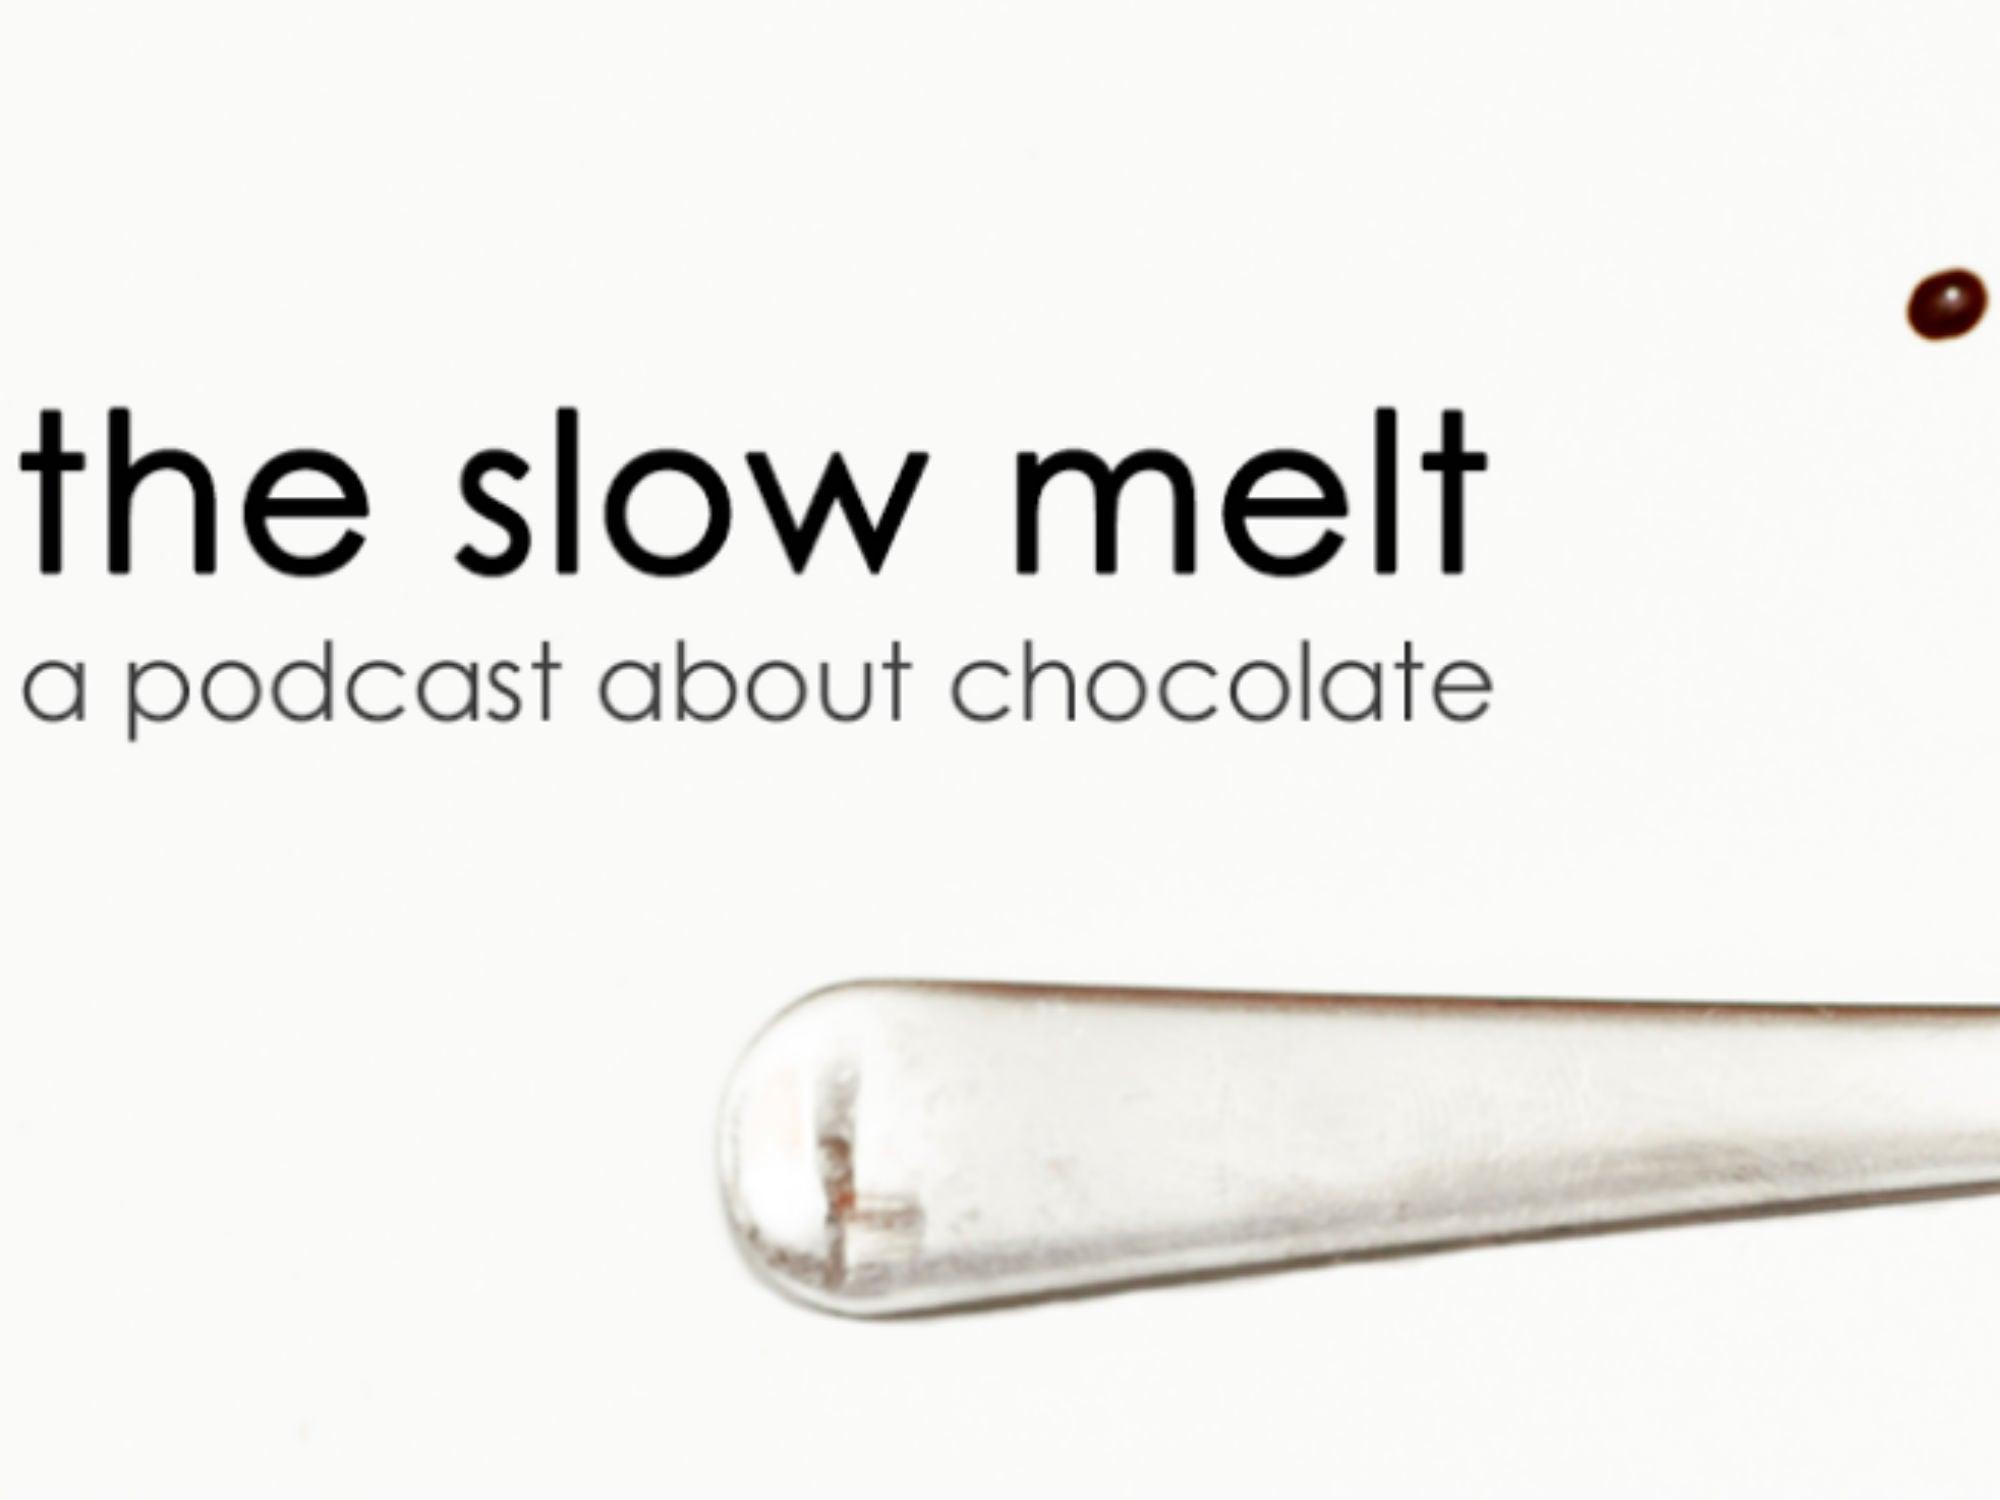 Meet the 2017 SAVEUR Blog Awards Finalists: 6 Great Food Podcasts